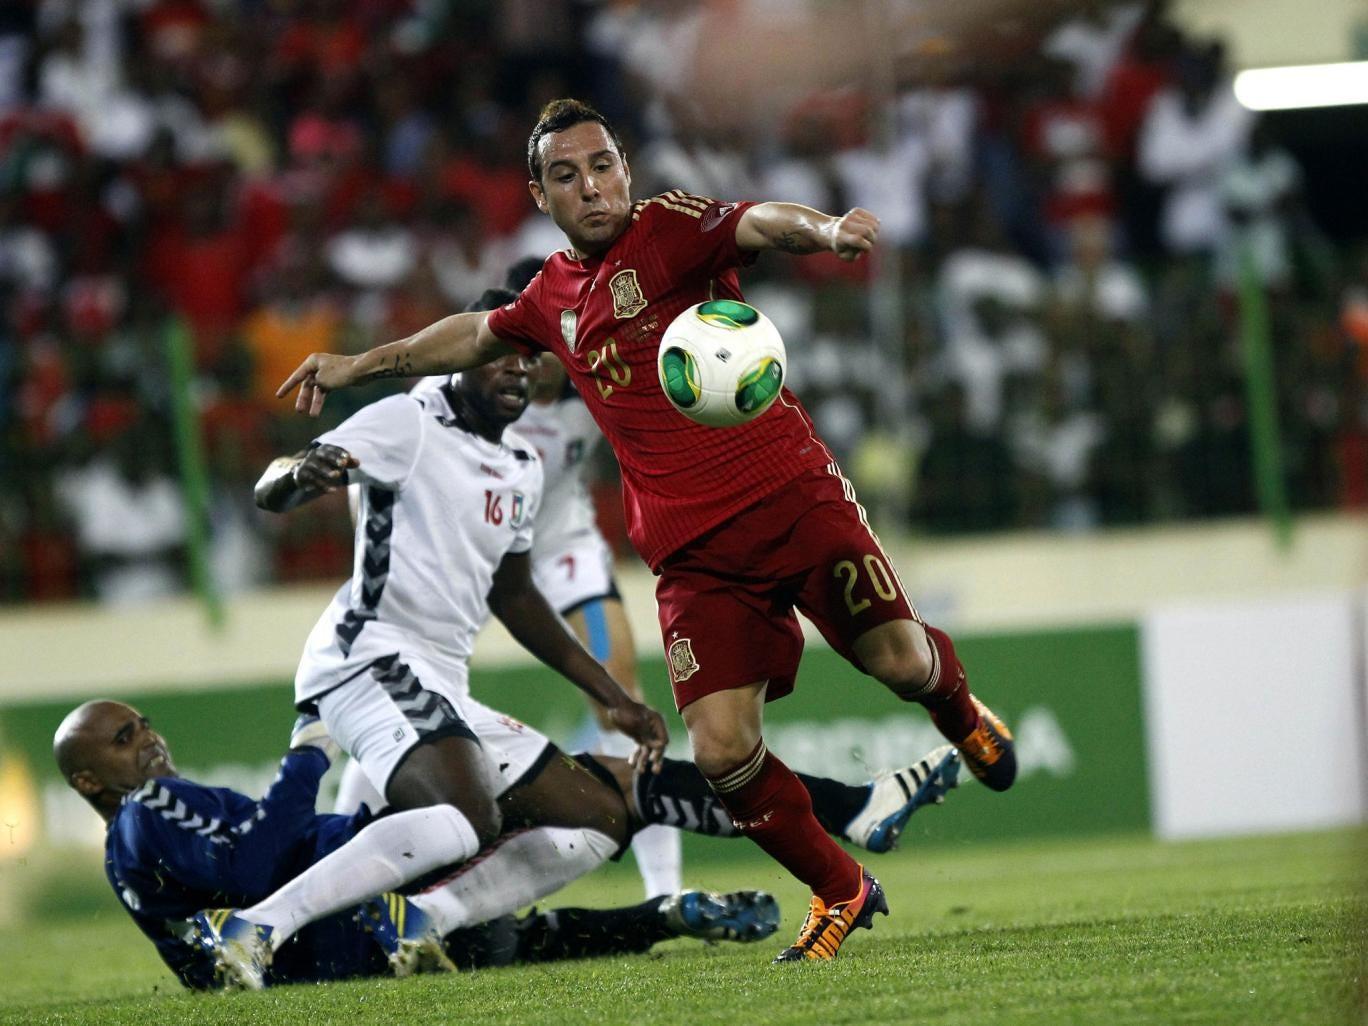 Santi Cazorla scores for Spain in their 2-1 win over Equatorial Guinea in Malabo